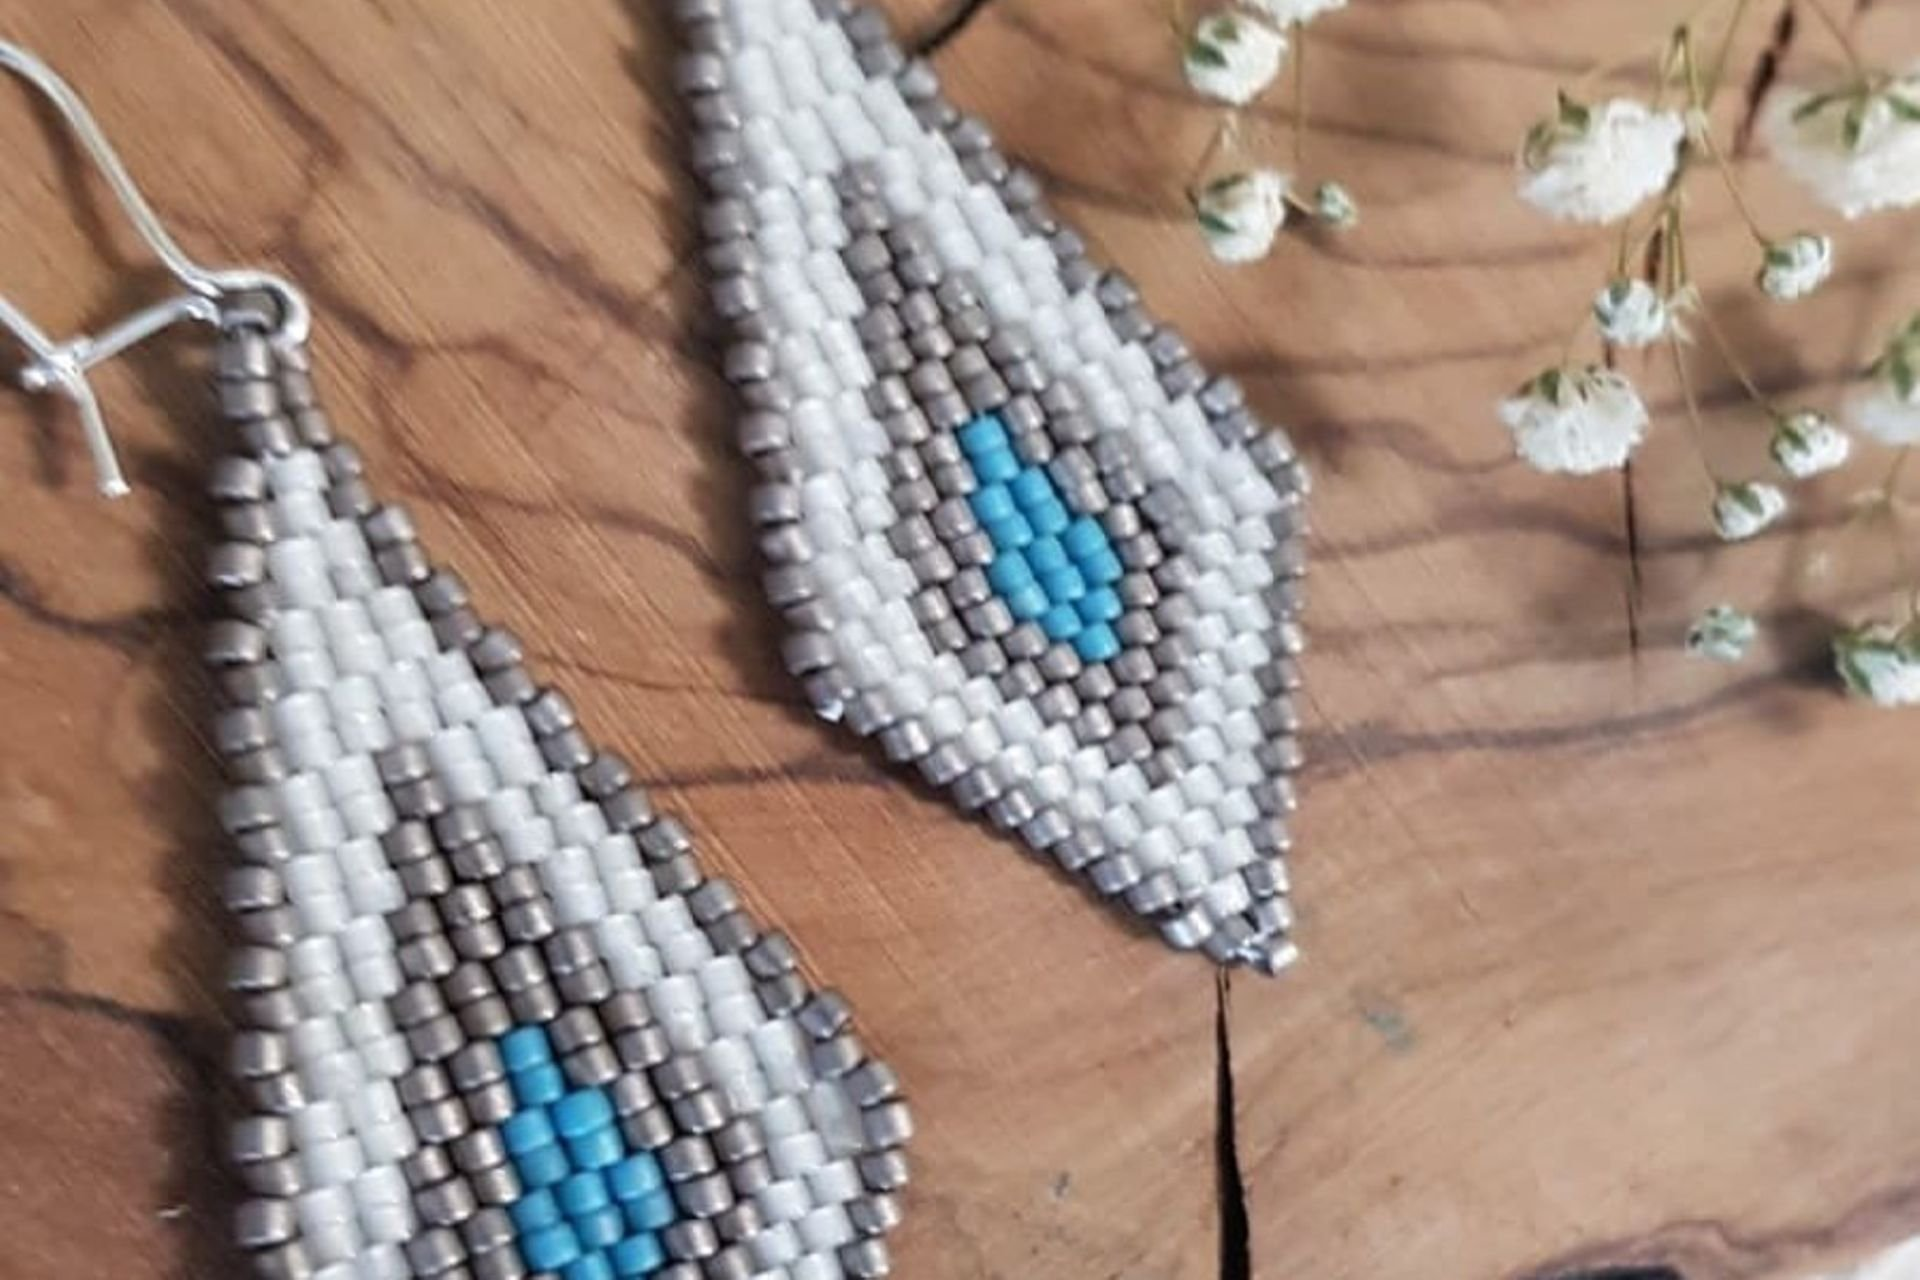 15 lantana beads jewelry designer תְמוּנָה